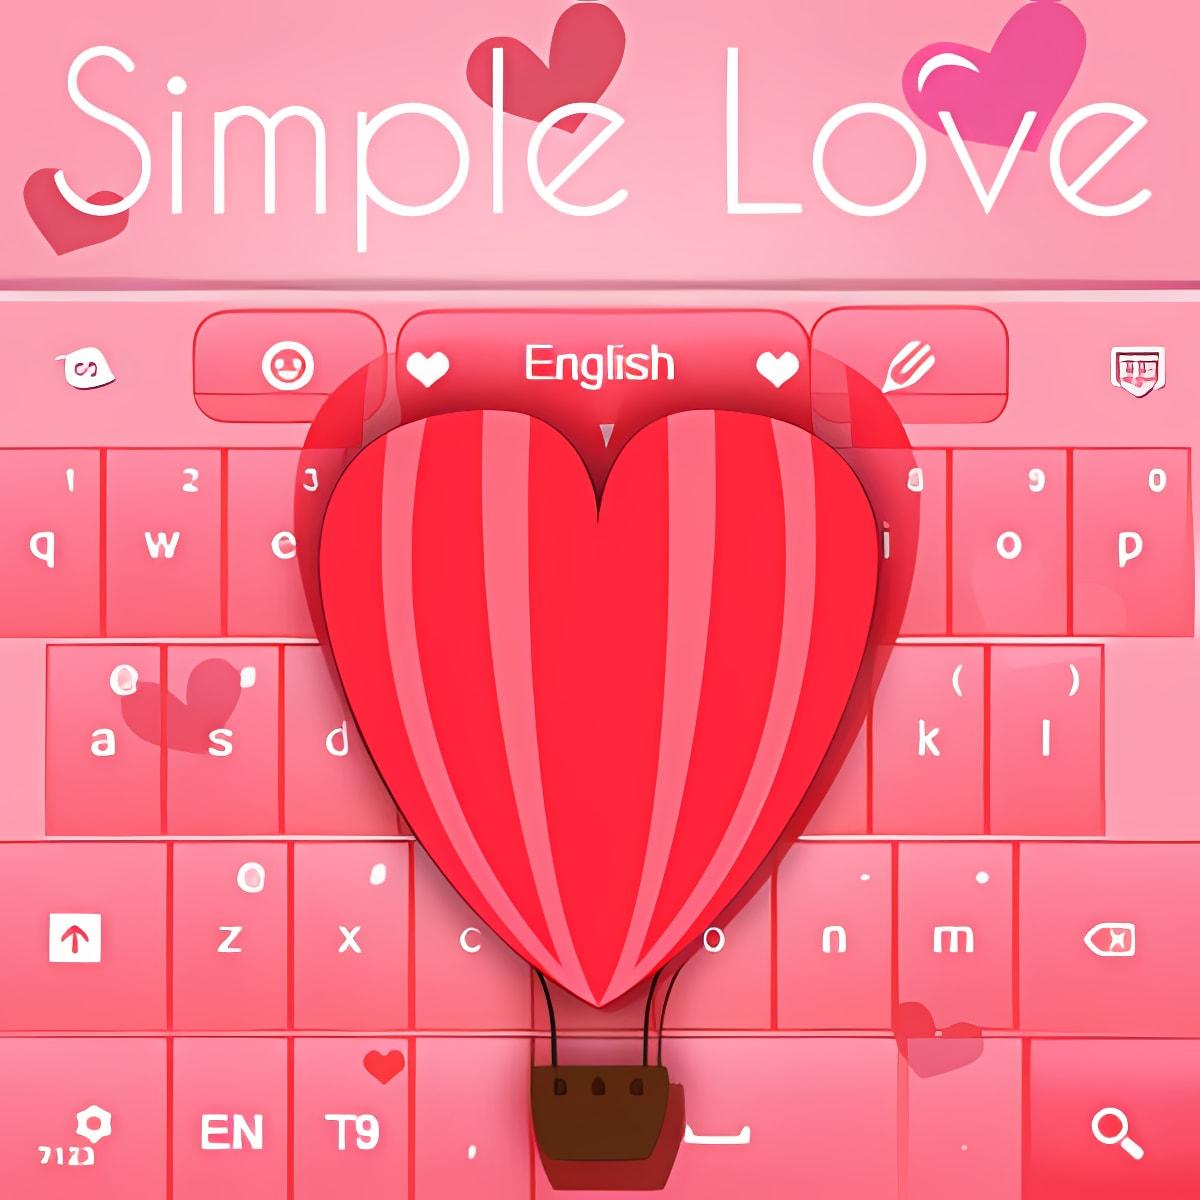 Teclado Love Theme simple